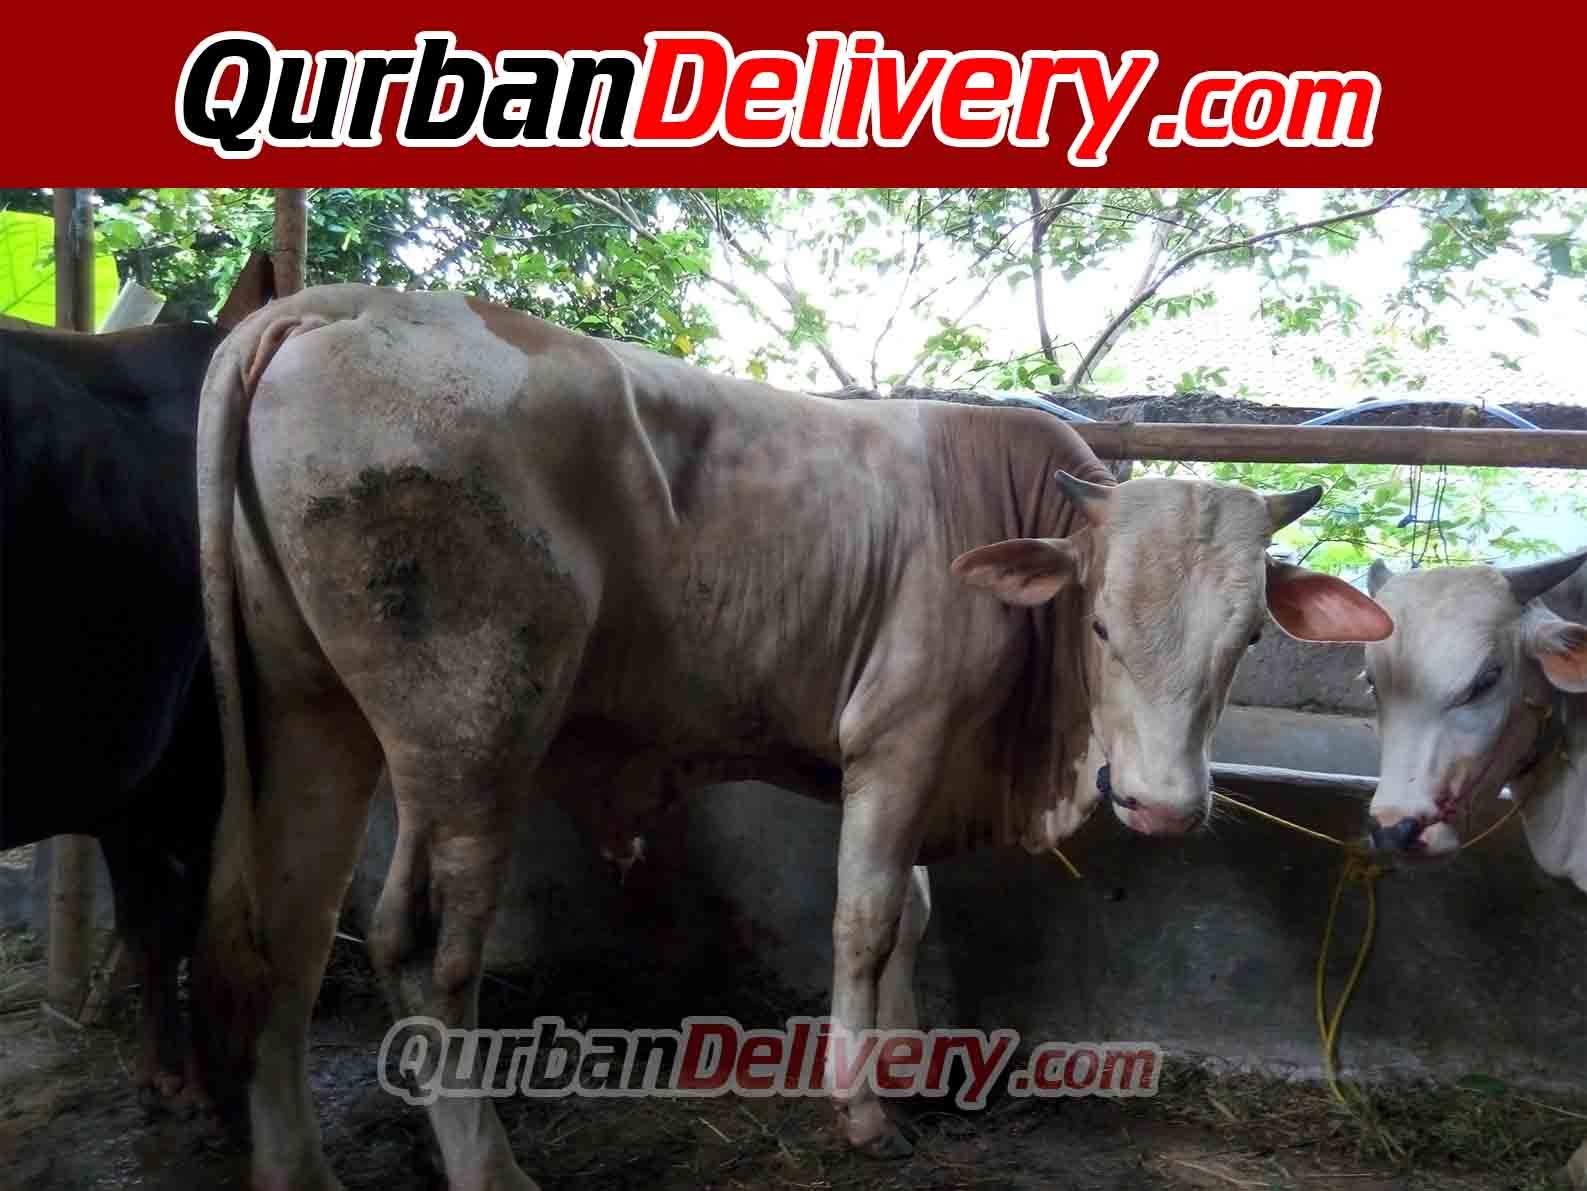 Jual Sapi Limosin Qurban Hari Ini Prediksi 2020-Qurban Delivery